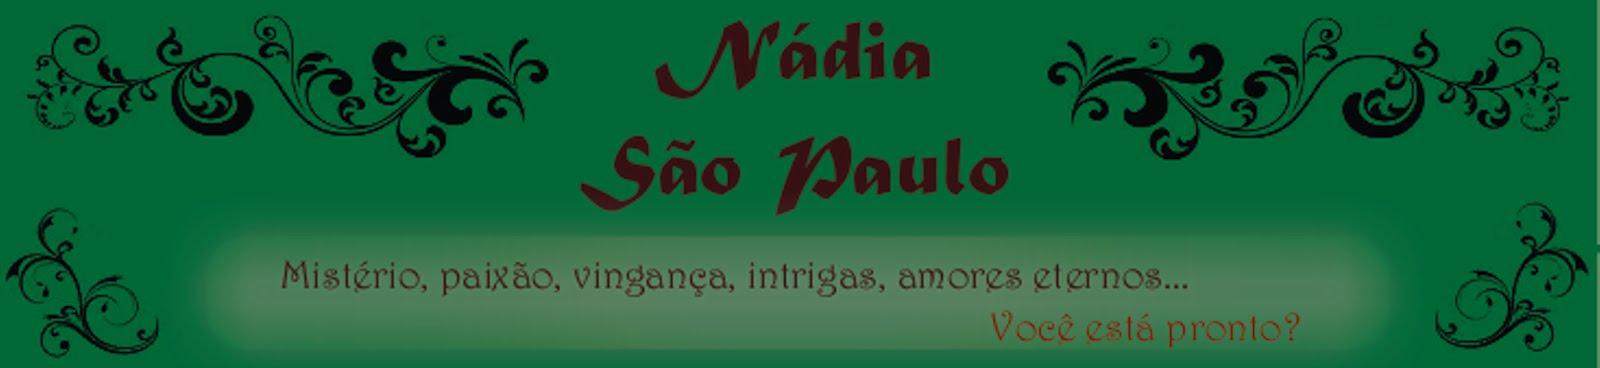 Nádia São Paulo